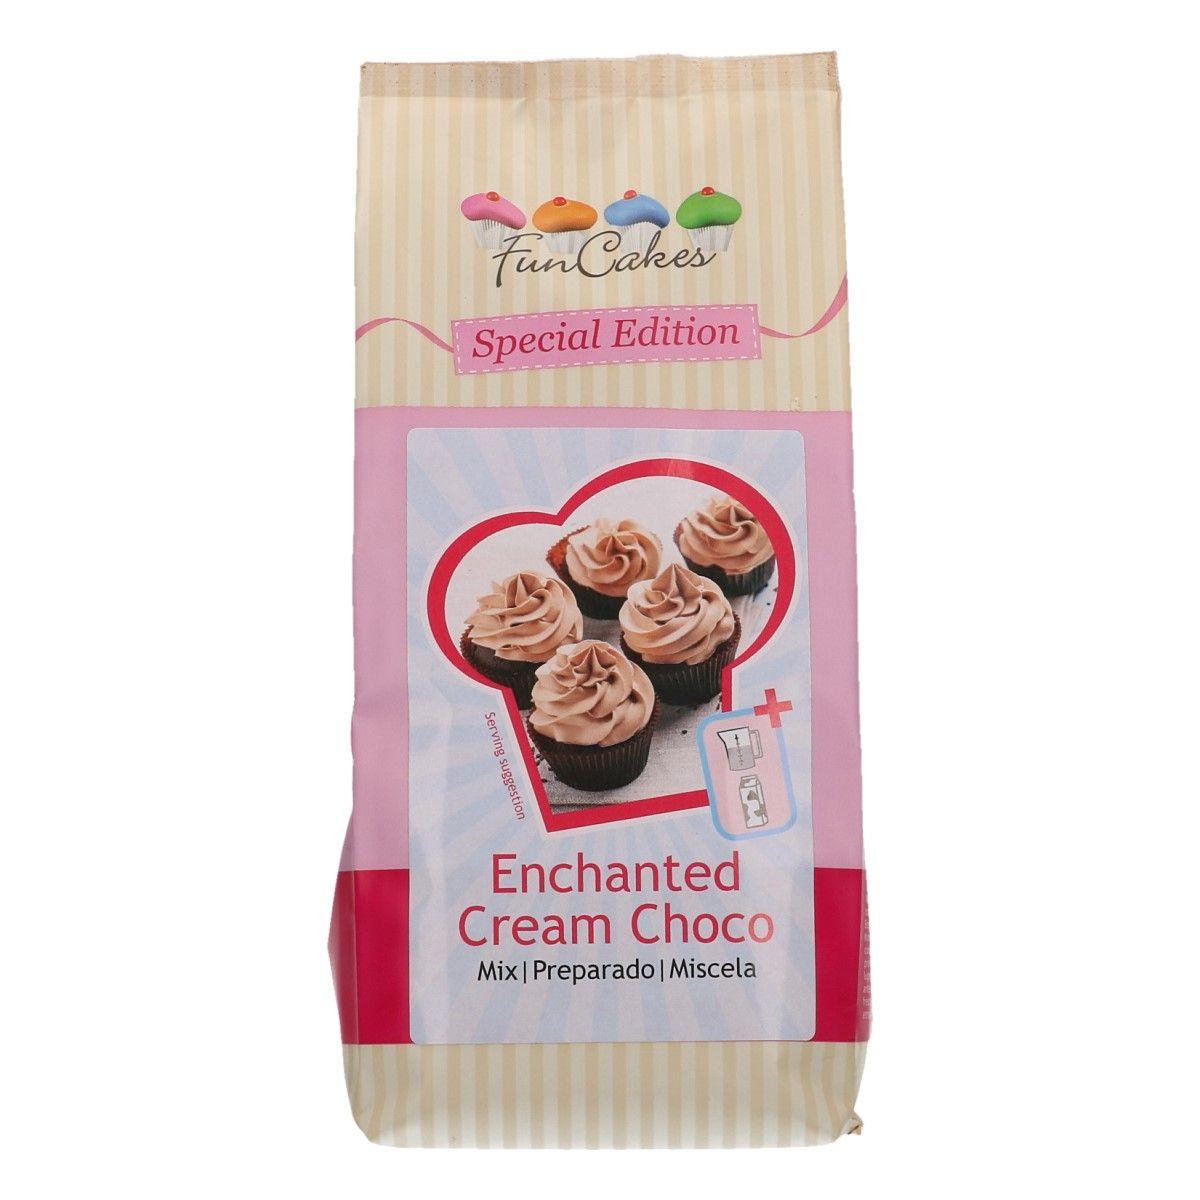 Enchanted Cream CHOCO 450g